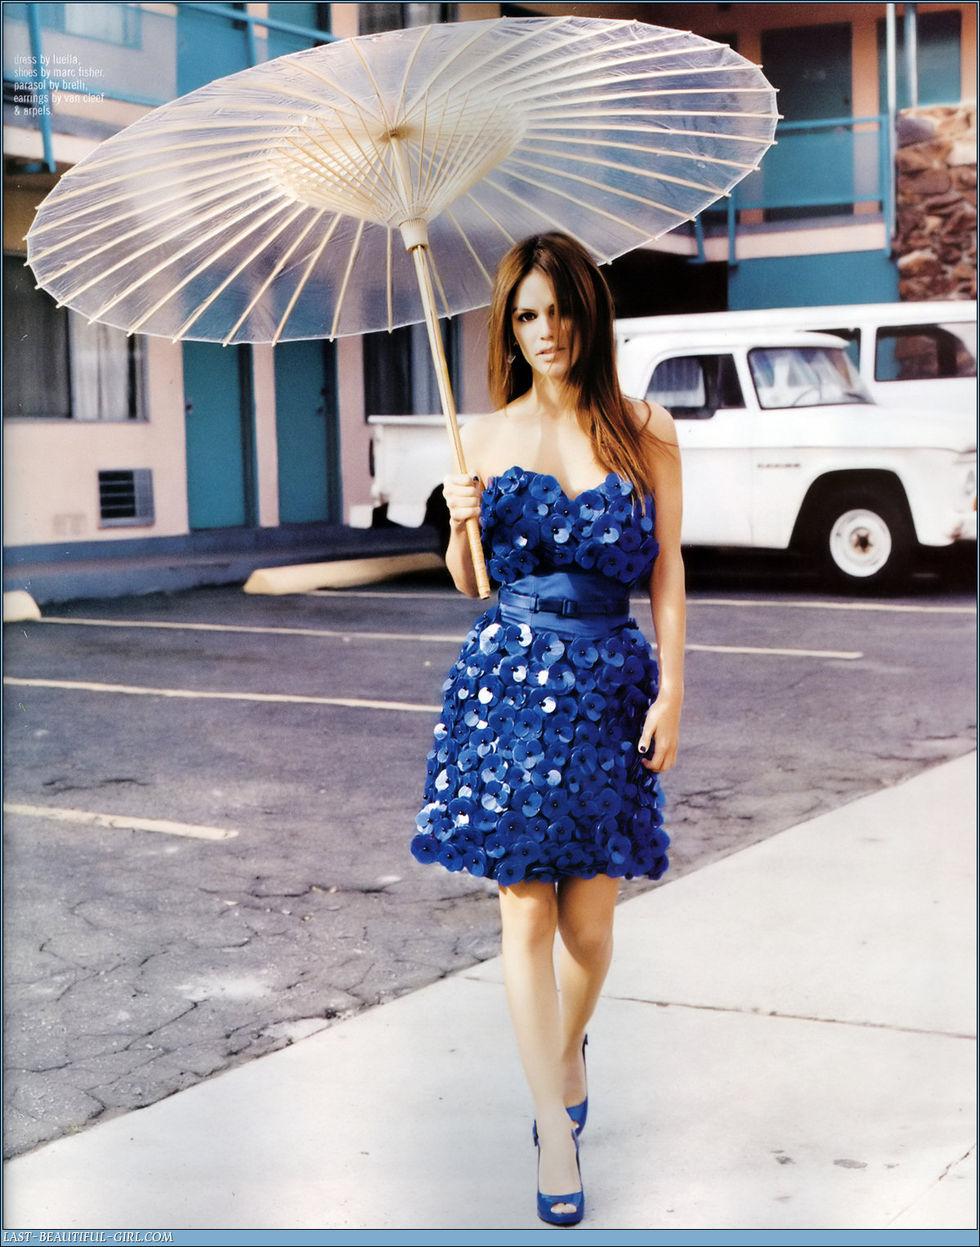 rachel-bilson-nylon-magazine-march-2008-hq-scans-01